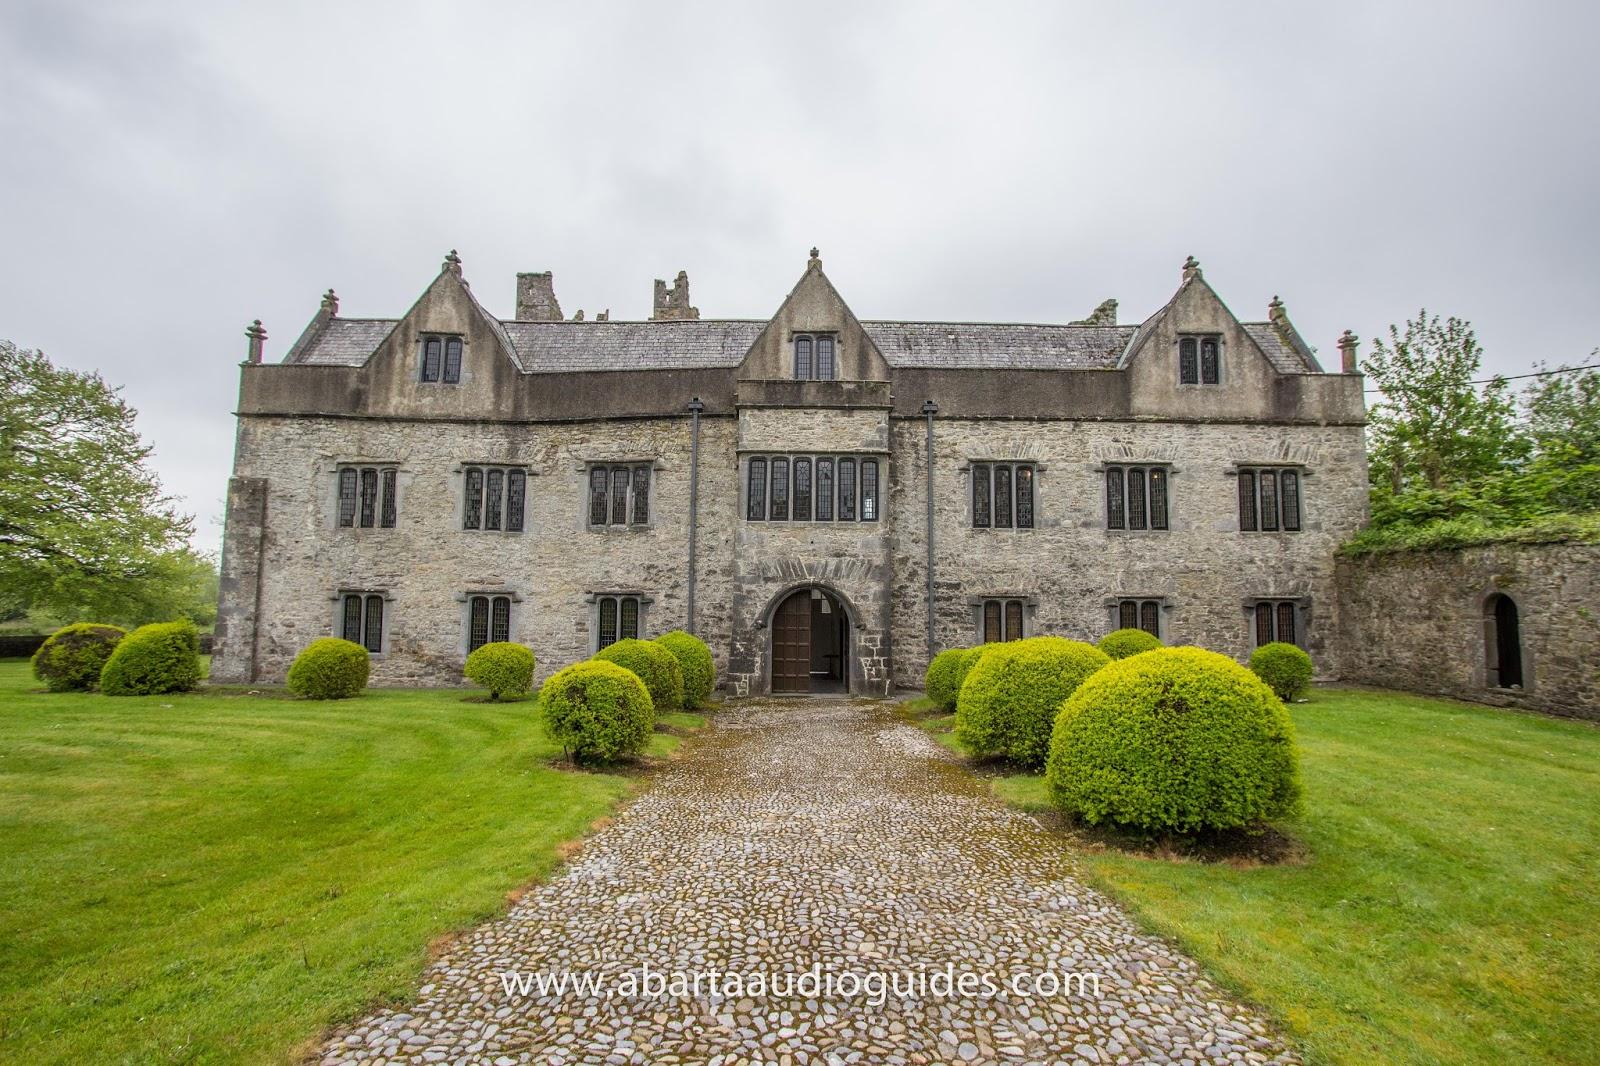 Ormond Castle - AbartaAudioGuides.com